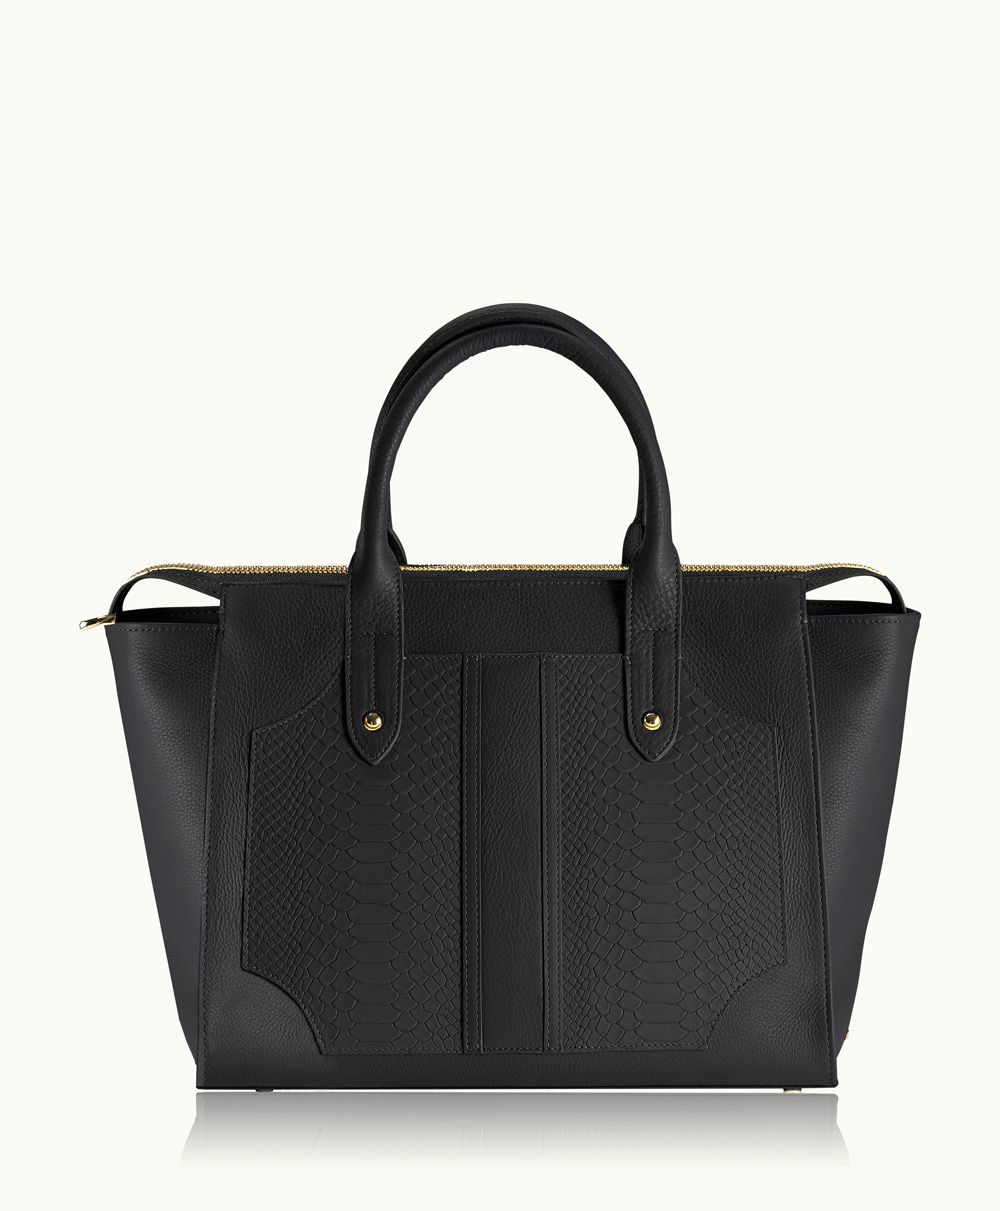 - Gold Initial Monogram Black Gates Satchel | Natural Grain and Embossed Python Leather | GiGi New York